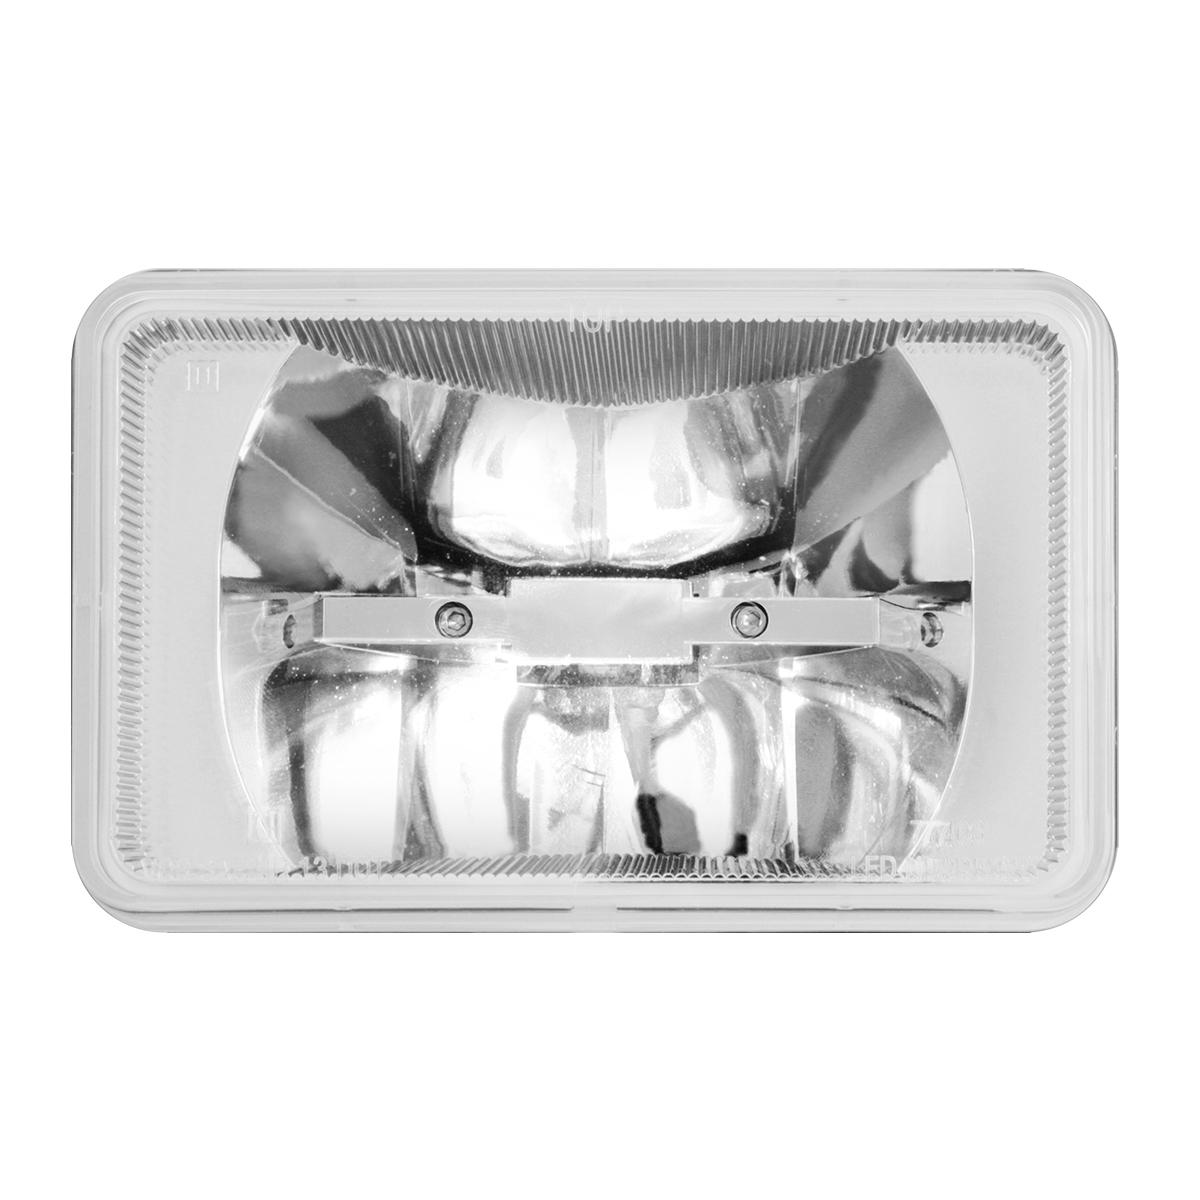 #77406 High Beam Super High Power LED Headlamp